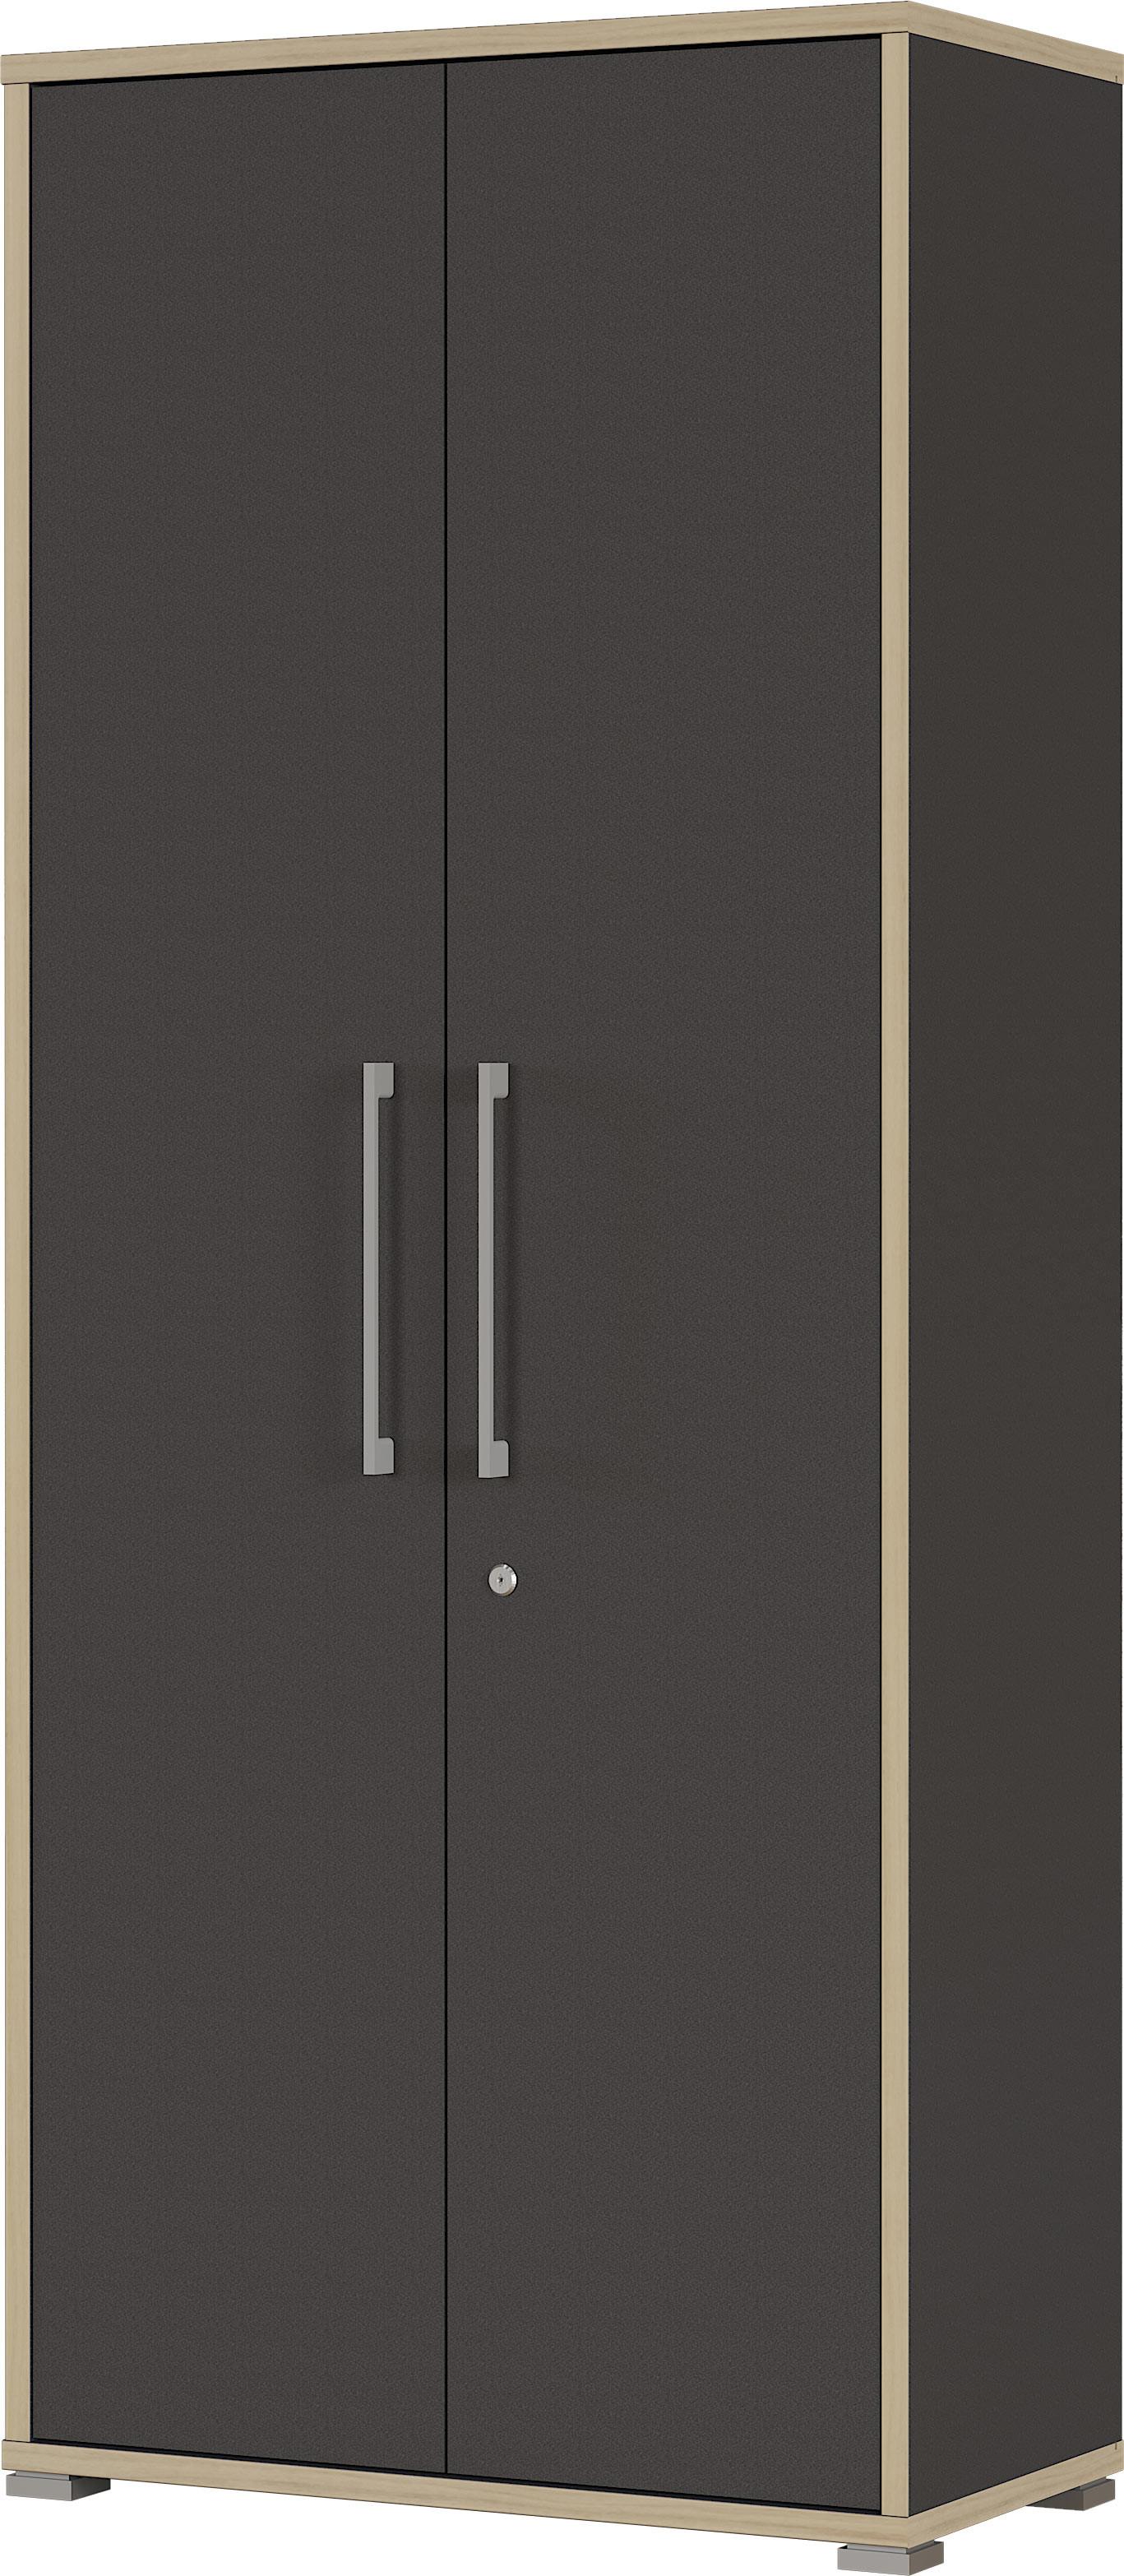 Armoire de bureau contemporaine anthracite hauteur 182 cm Garland